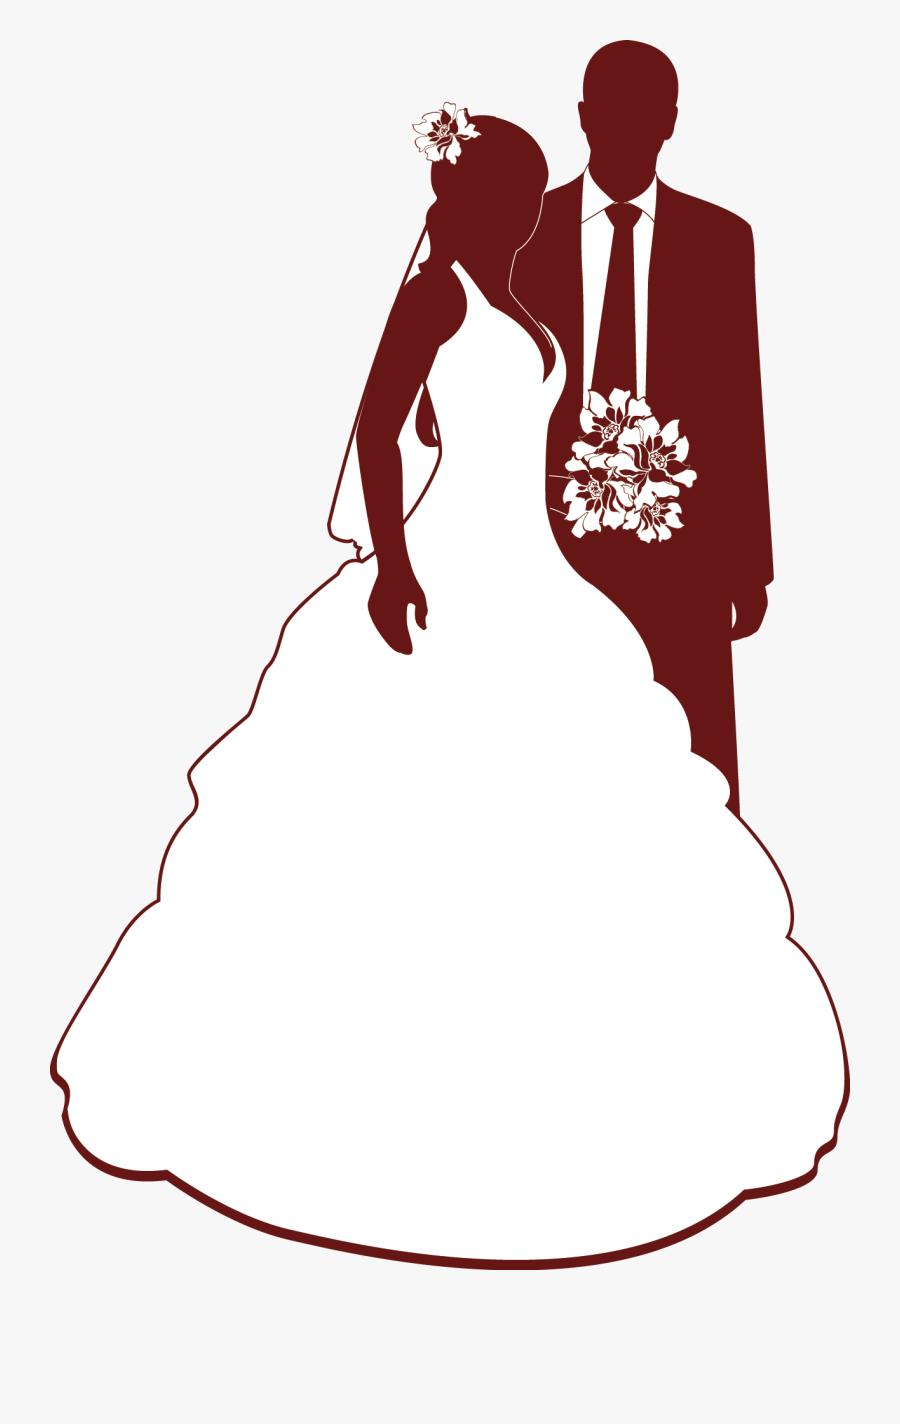 Transparent Bride Silhouette Png - Clip Art For Wedding Invitation, Transparent Clipart